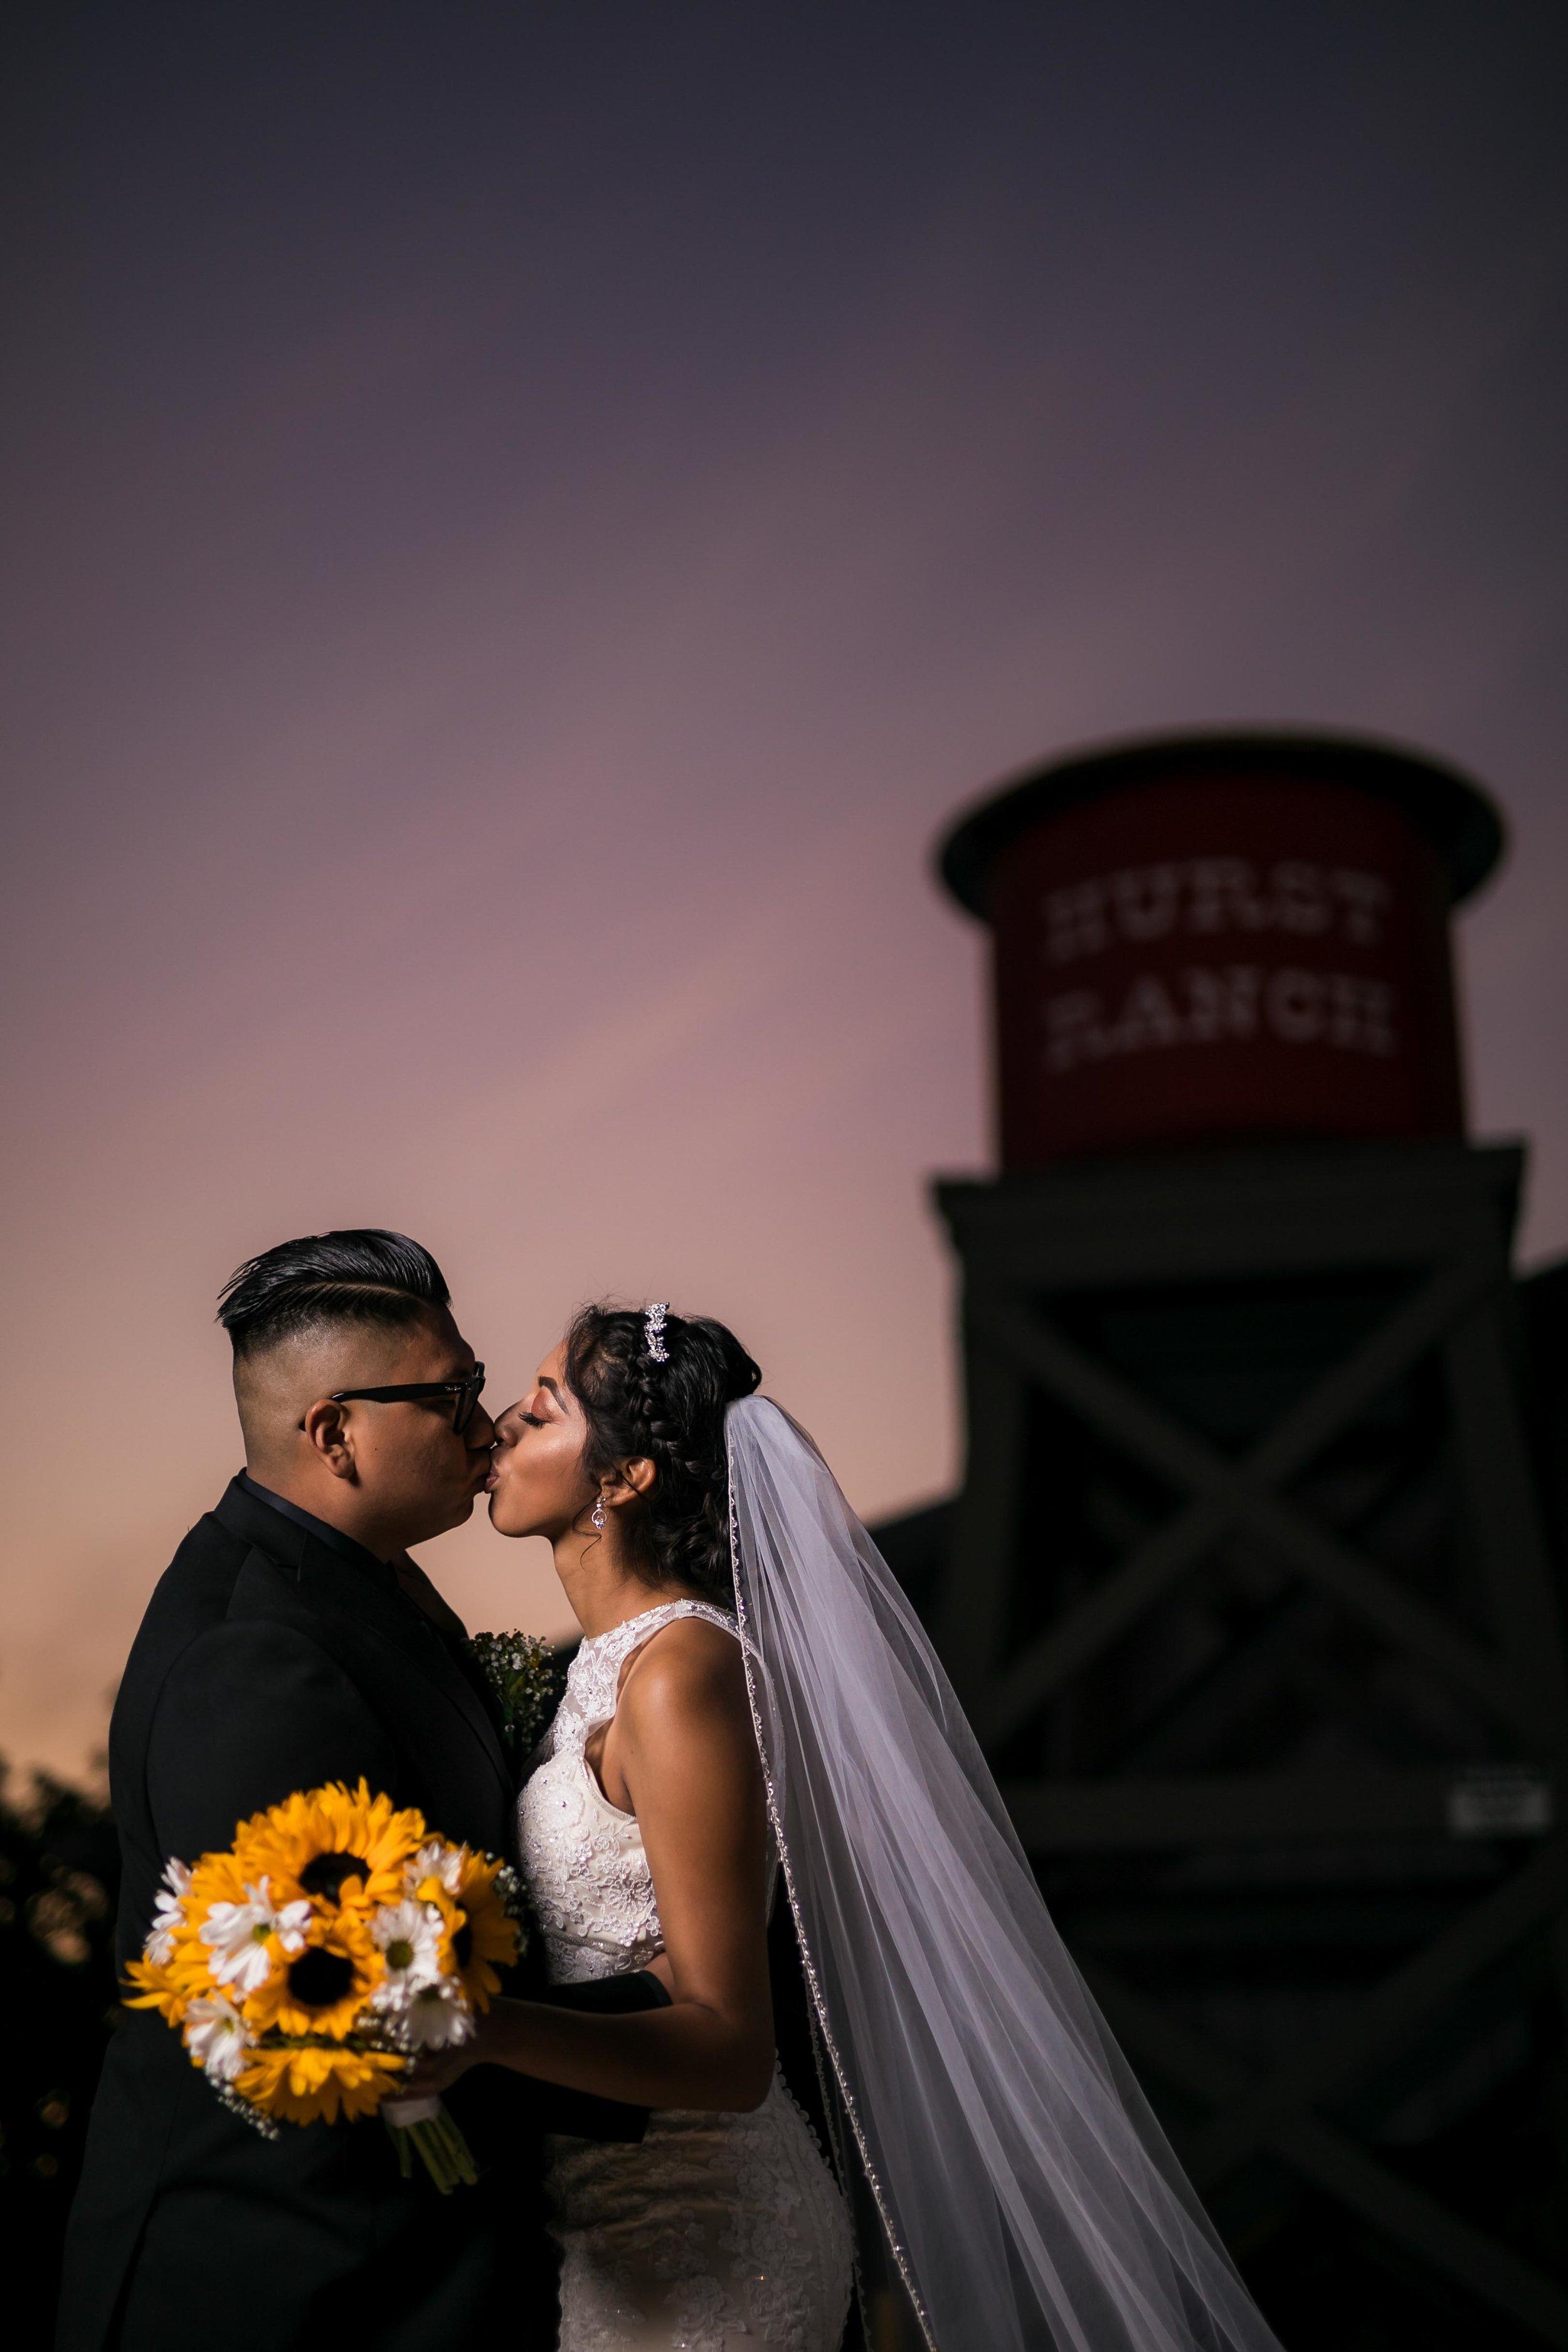 mexican_southern_california_wedding_joshuachun_photography-7.JPG